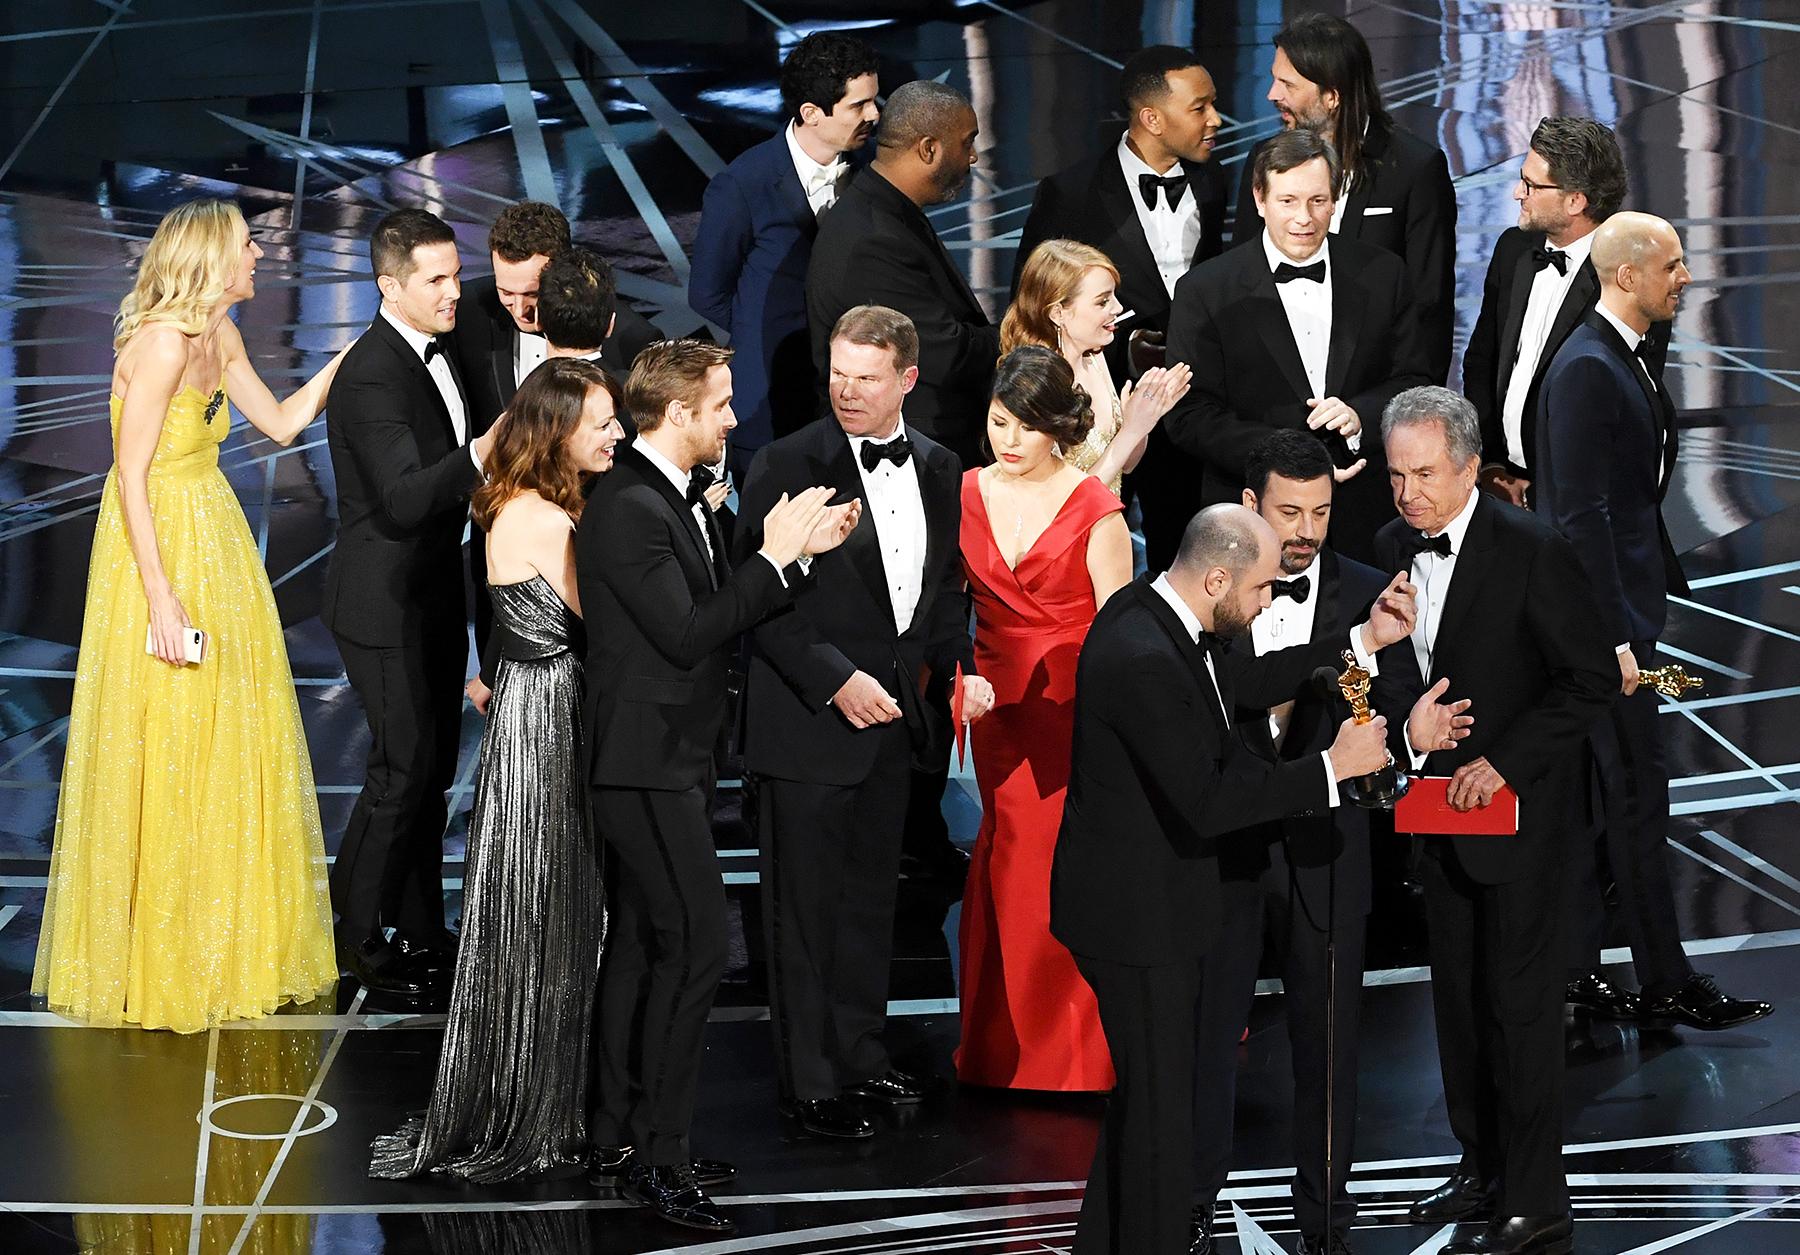 PricewaterhouseCoopers Accountants Brian Cullinan Martha Ruiz Oscars 2017